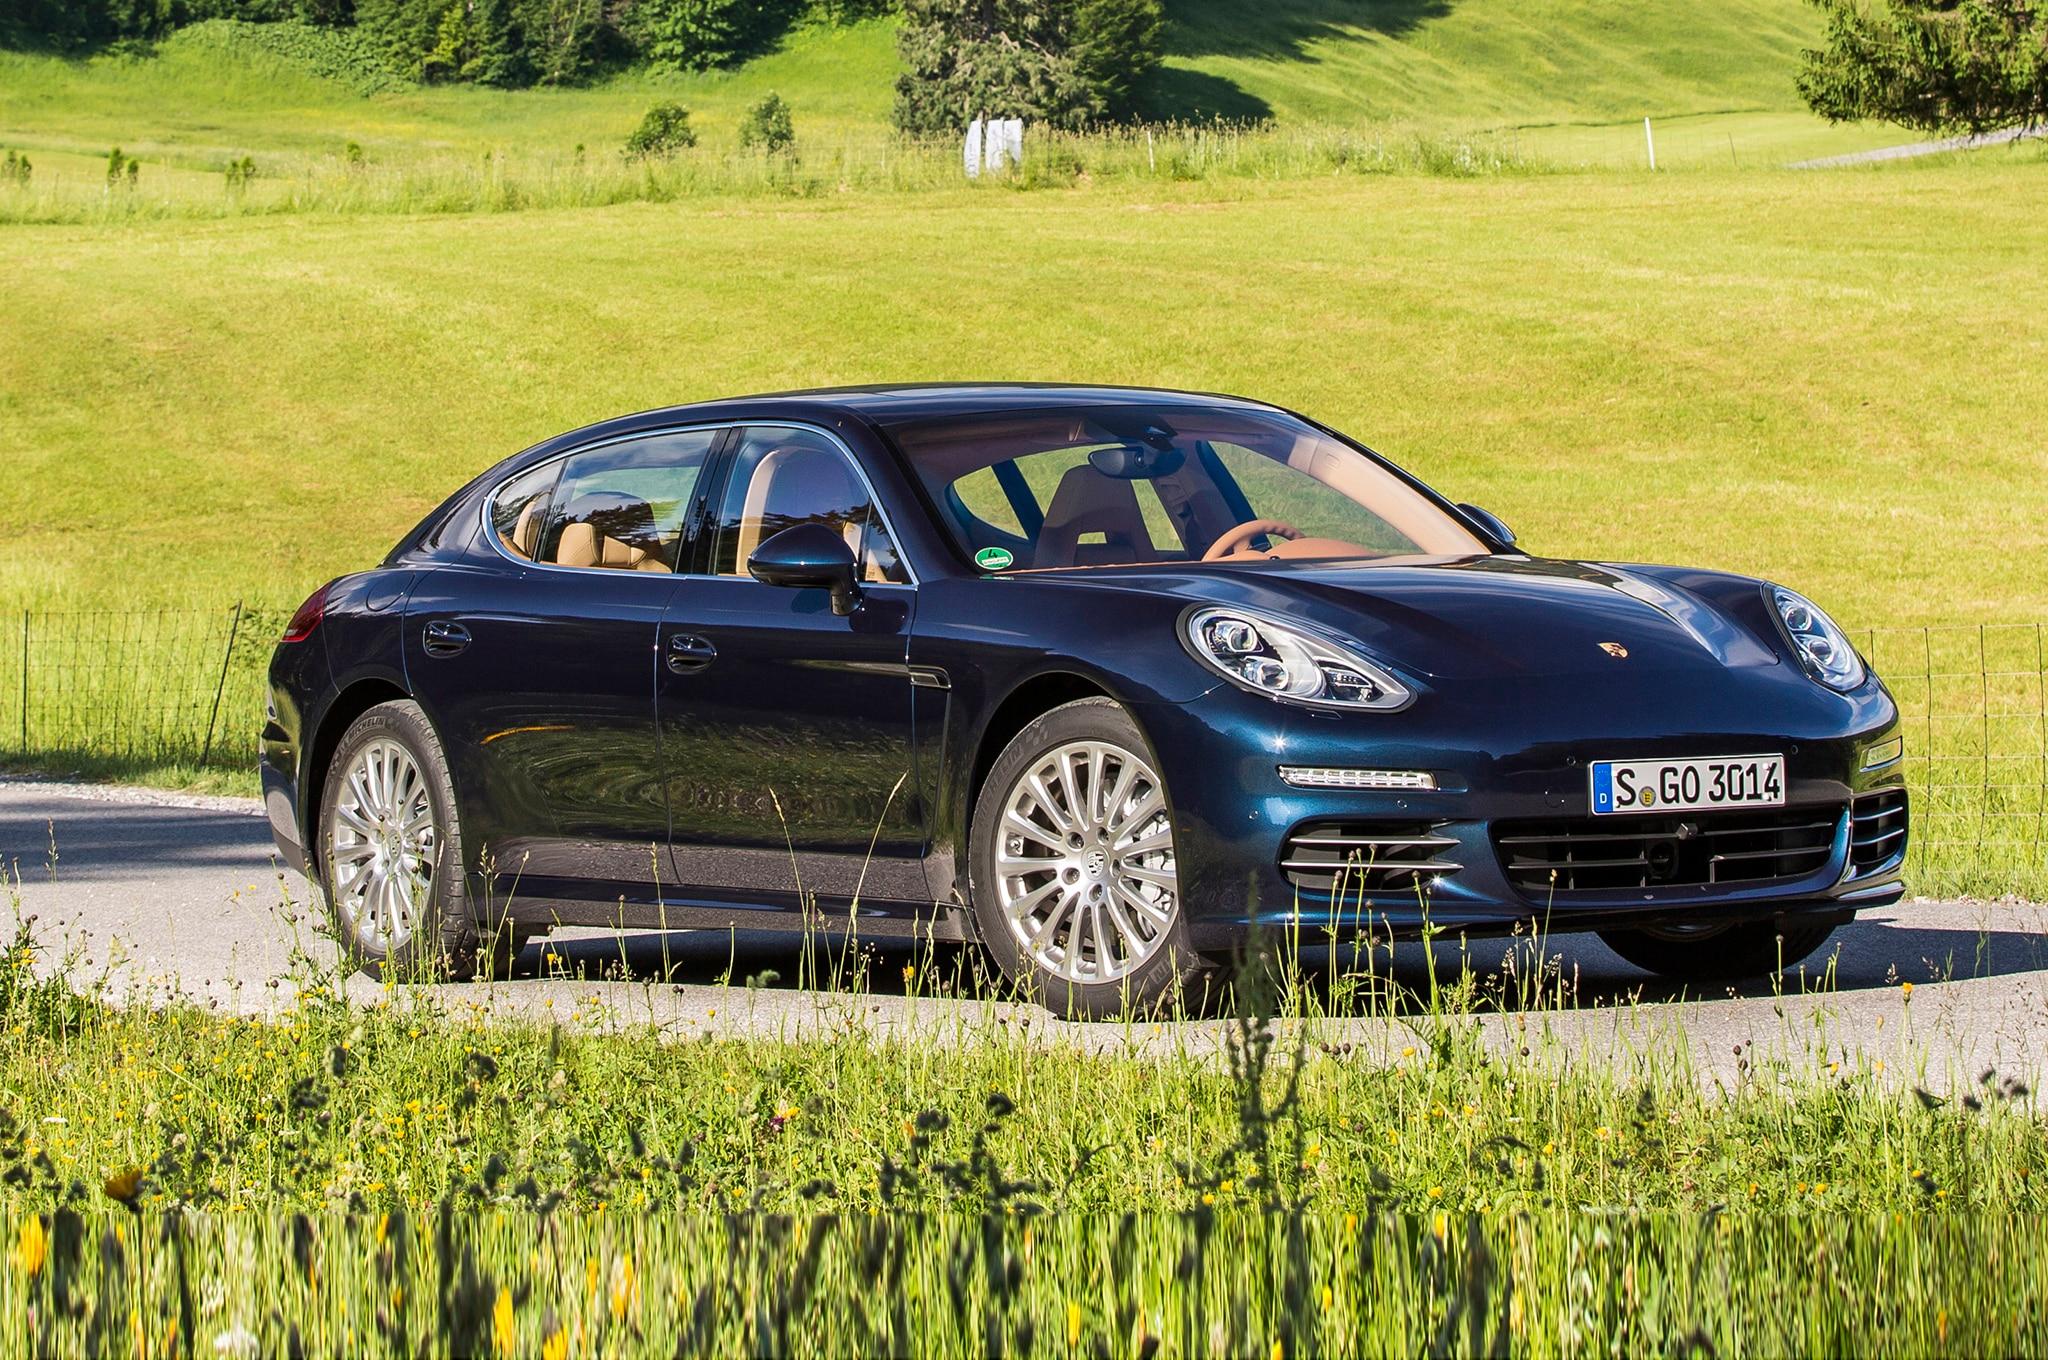 2014 Porsche Panamera 4S Three Quarters Side View1